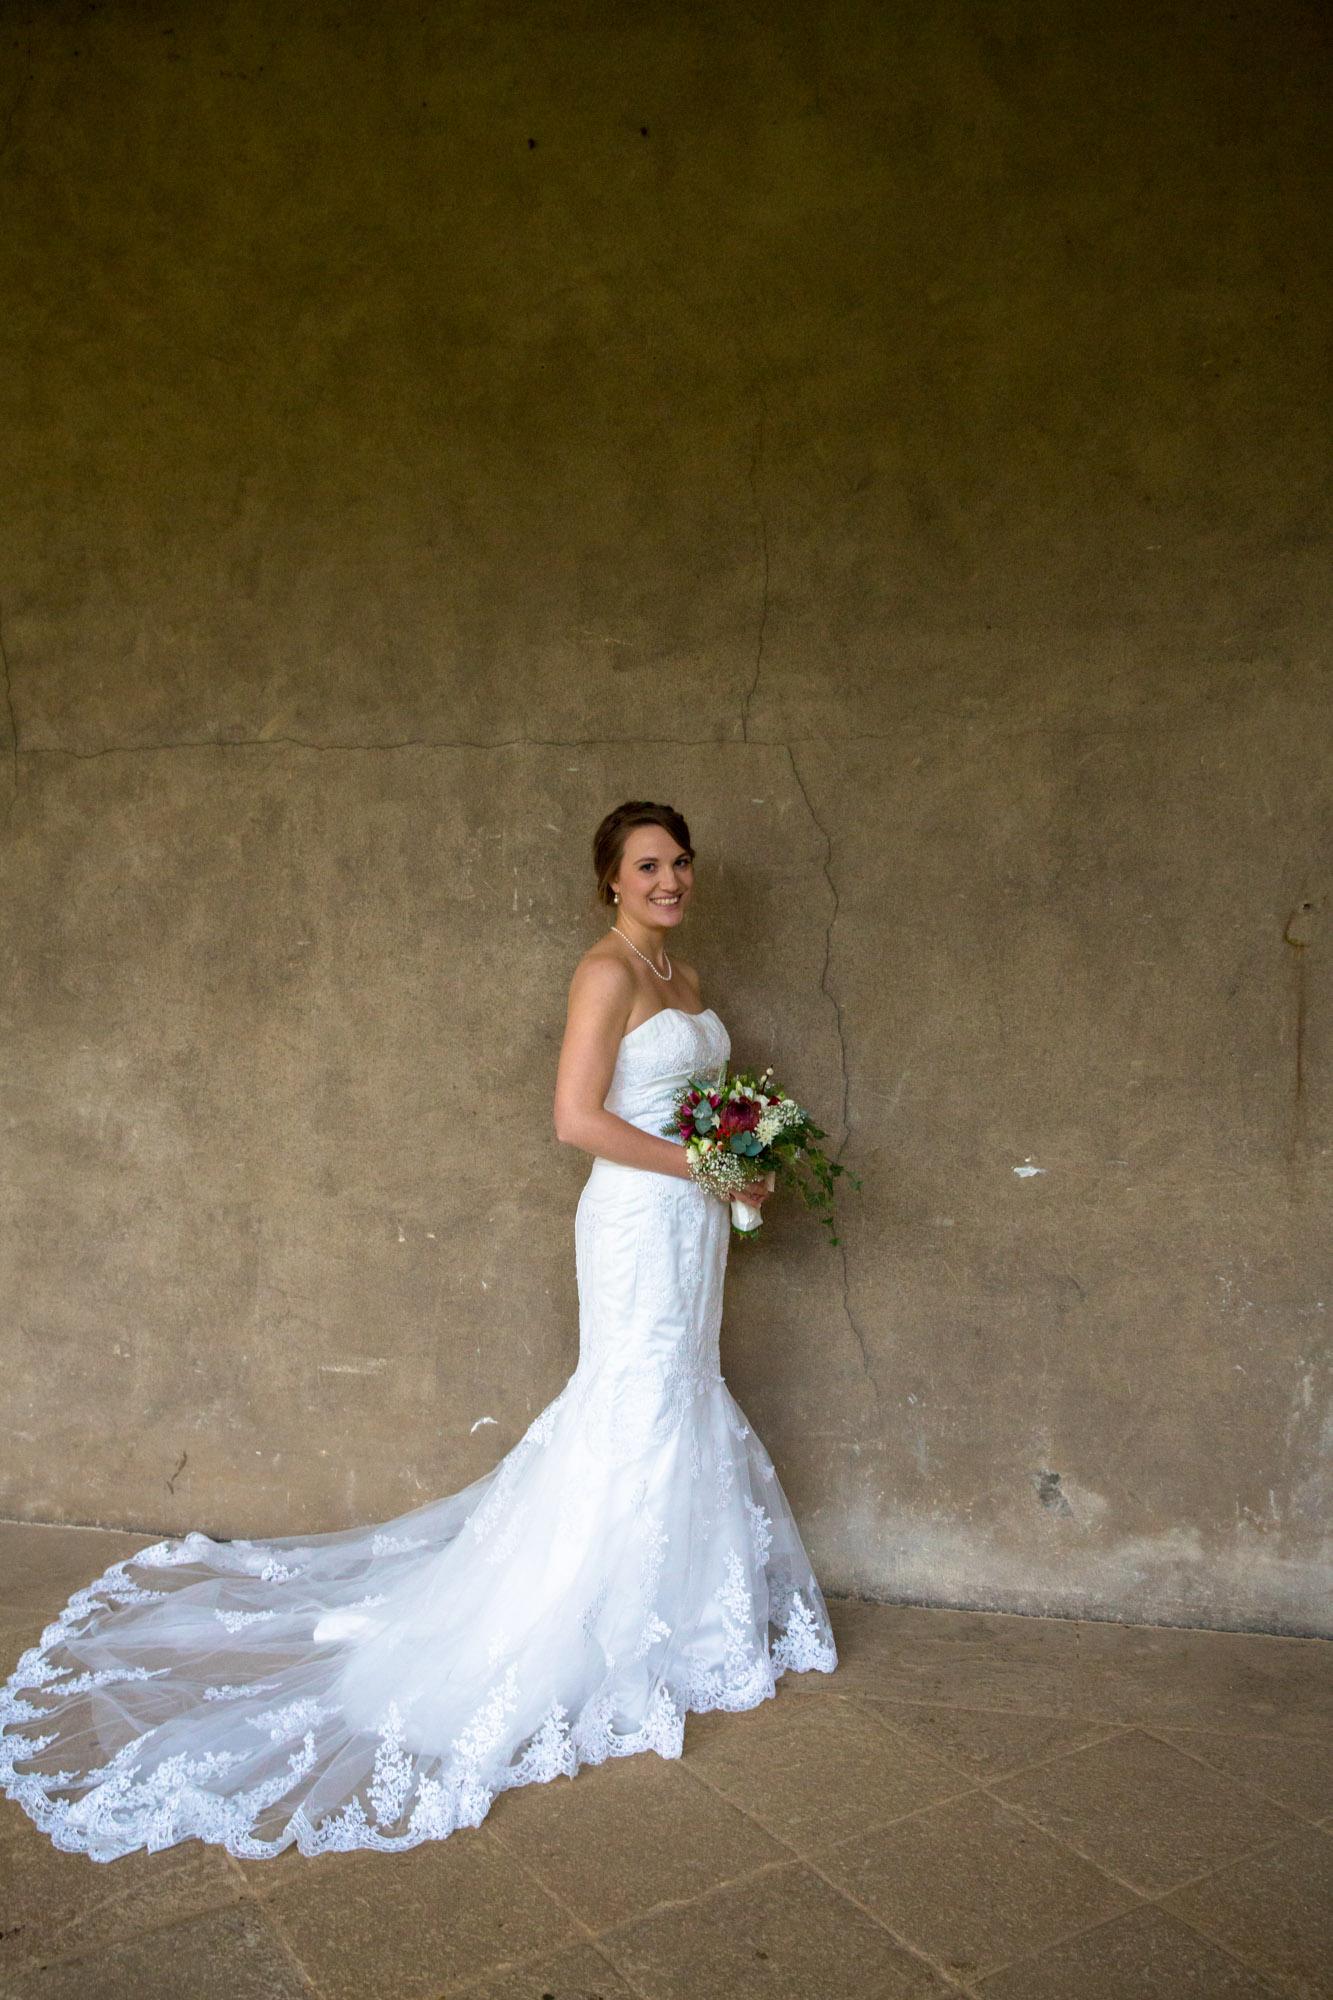 weddings-couples-love-photographer-oxford-london-jonathan-self-photography-89.jpg